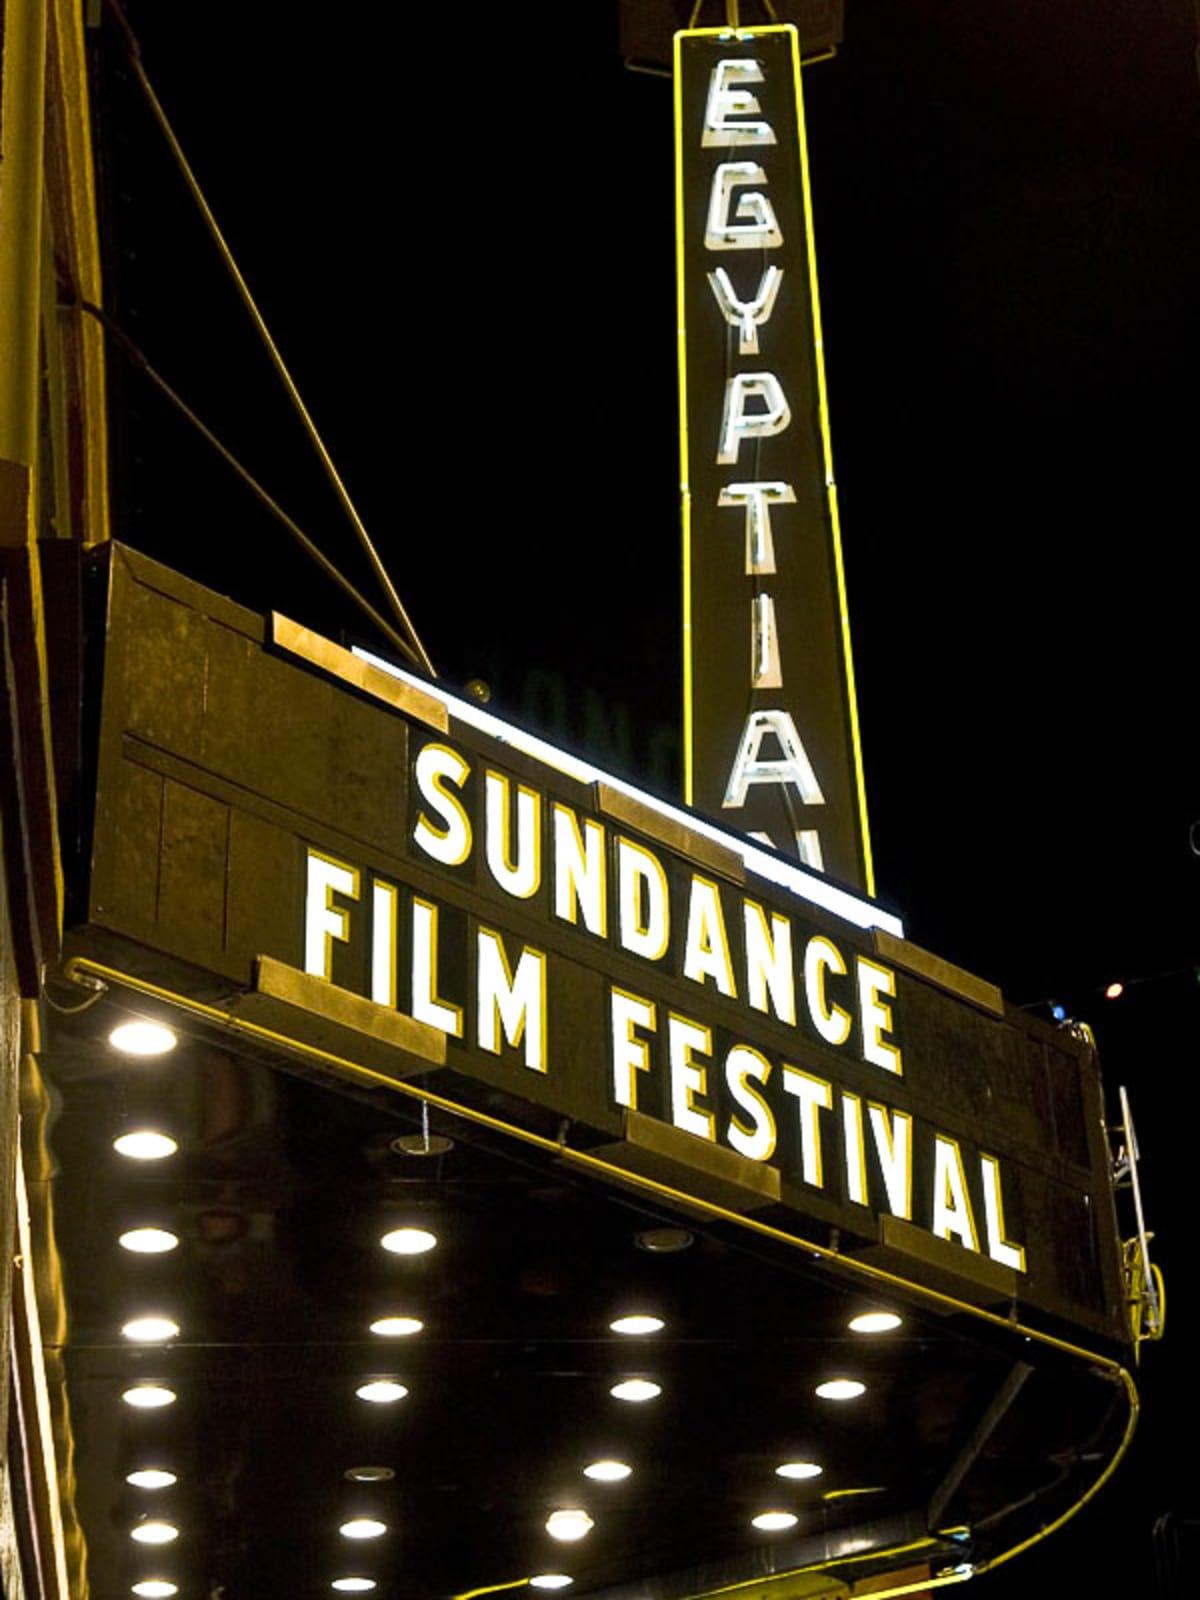 News_Sundance Film Festival_jan 10